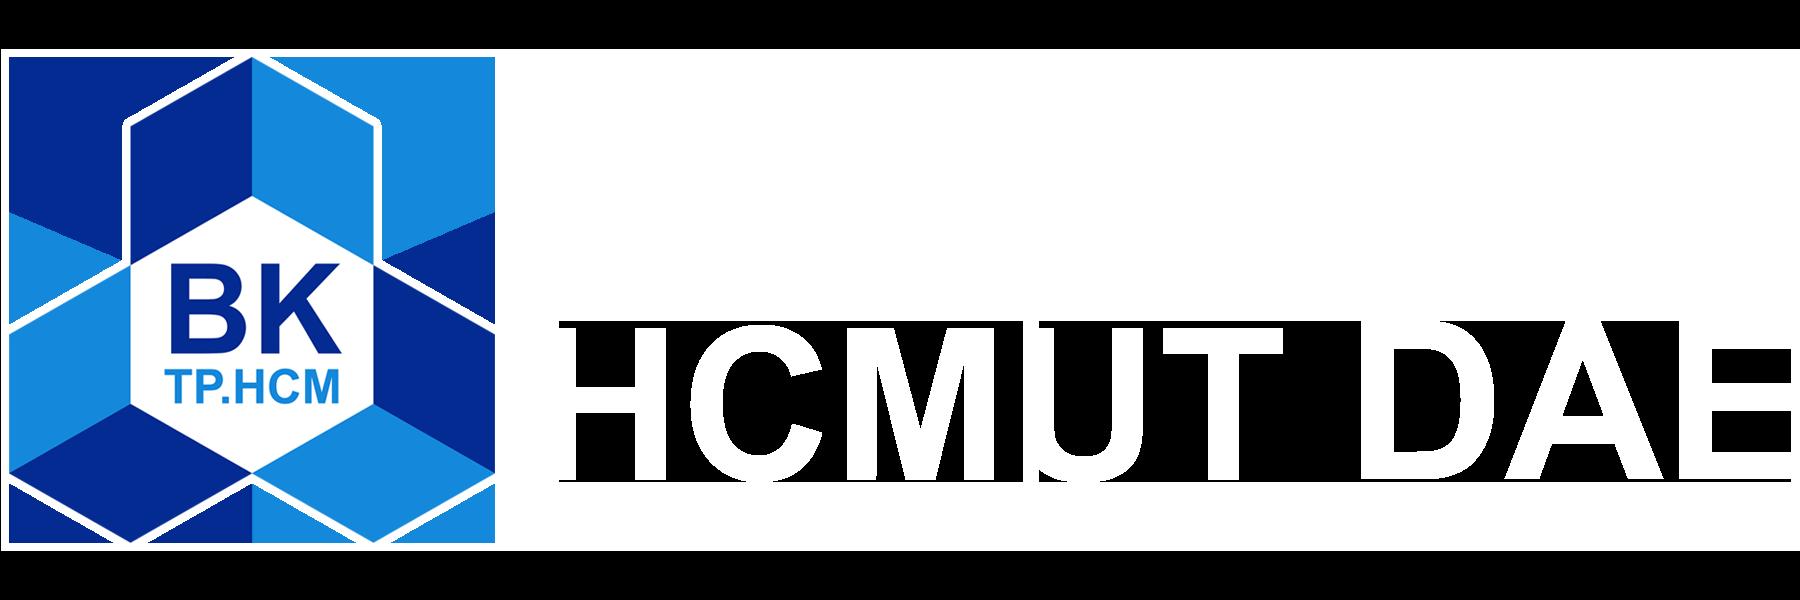 HCMUT DAE